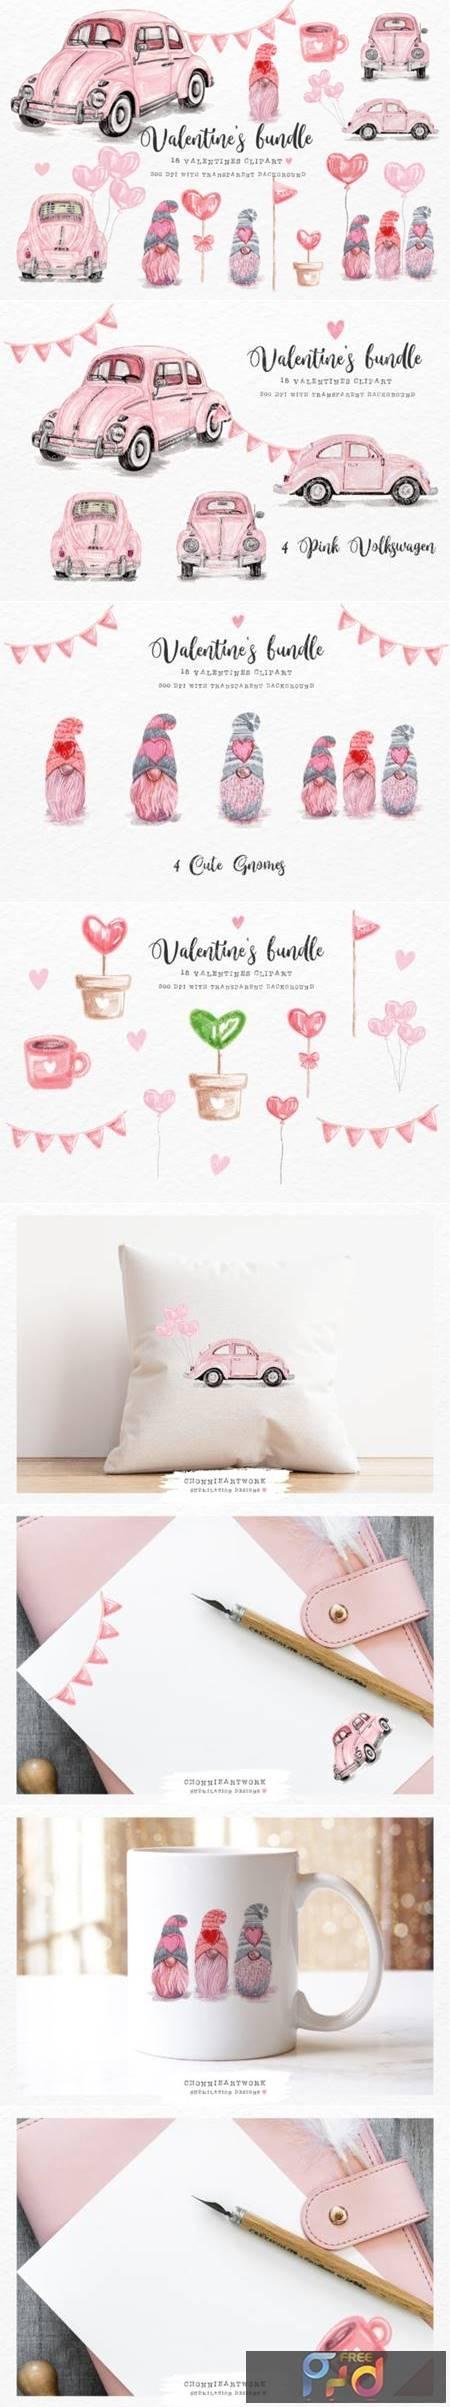 Valentines Day Bundle with Volkswagen 6916987 1